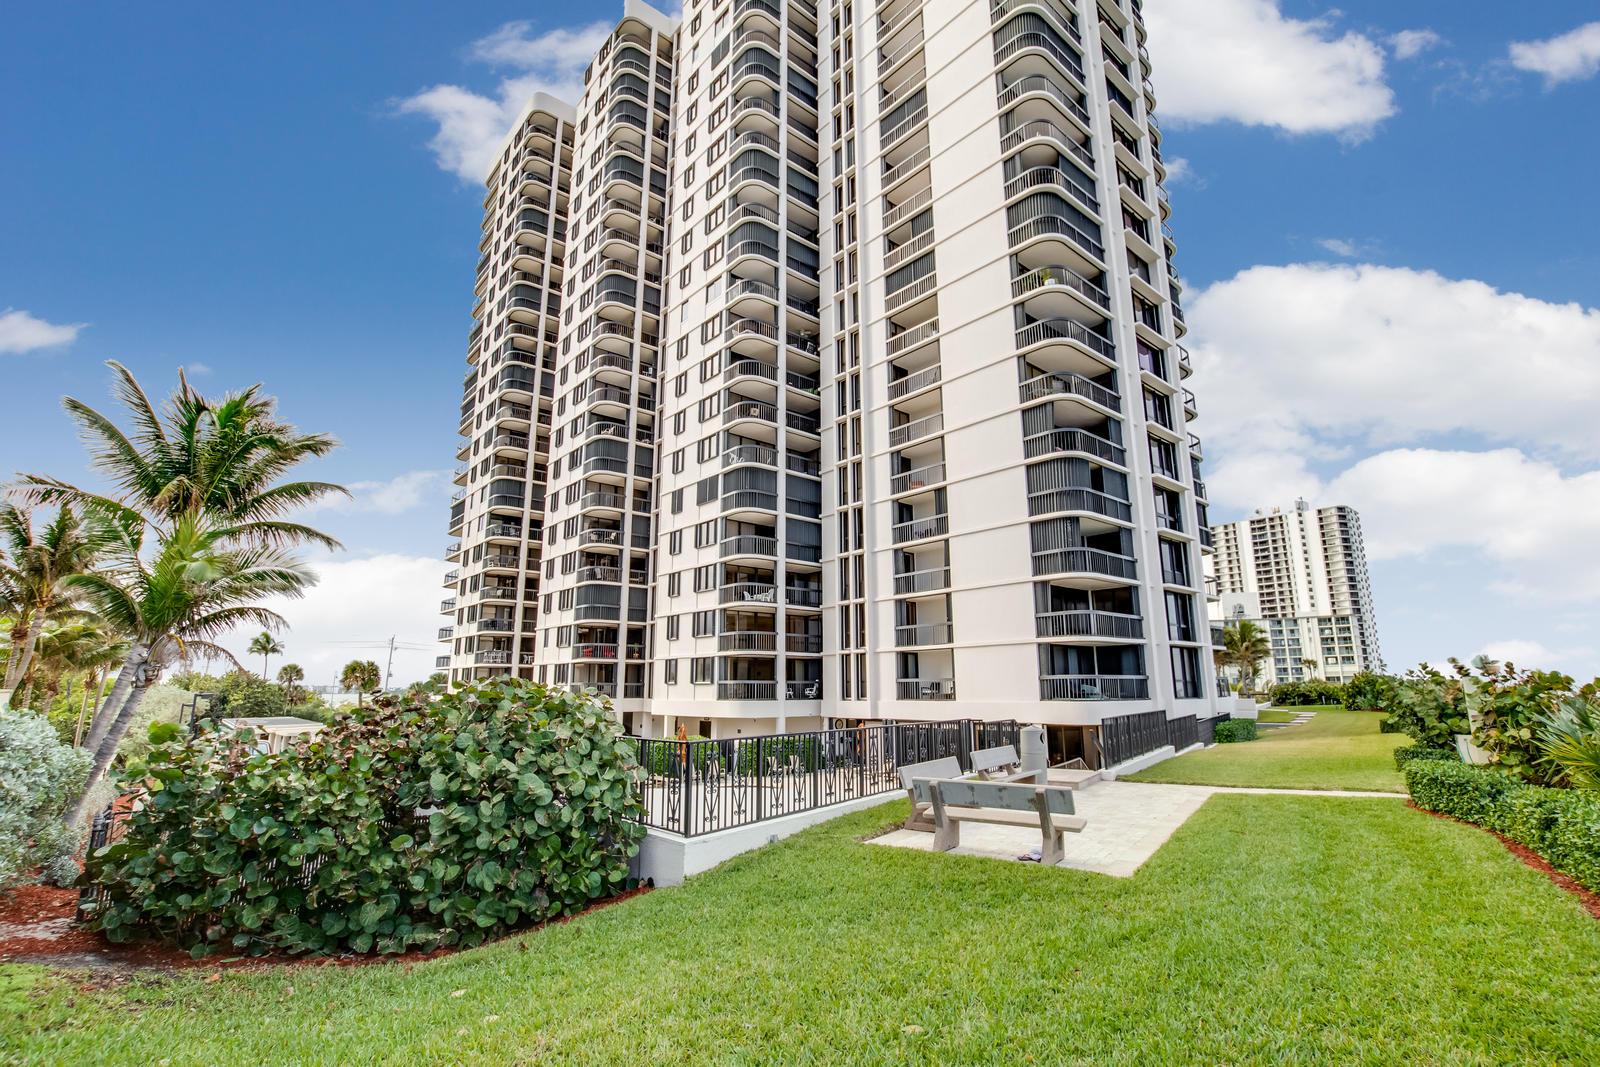 5380 Ocean Drive 10-E, Singer Island, Florida 33404, 2 Bedrooms Bedrooms, ,2 BathroomsBathrooms,A,Condominium,Ocean,RX-10500806